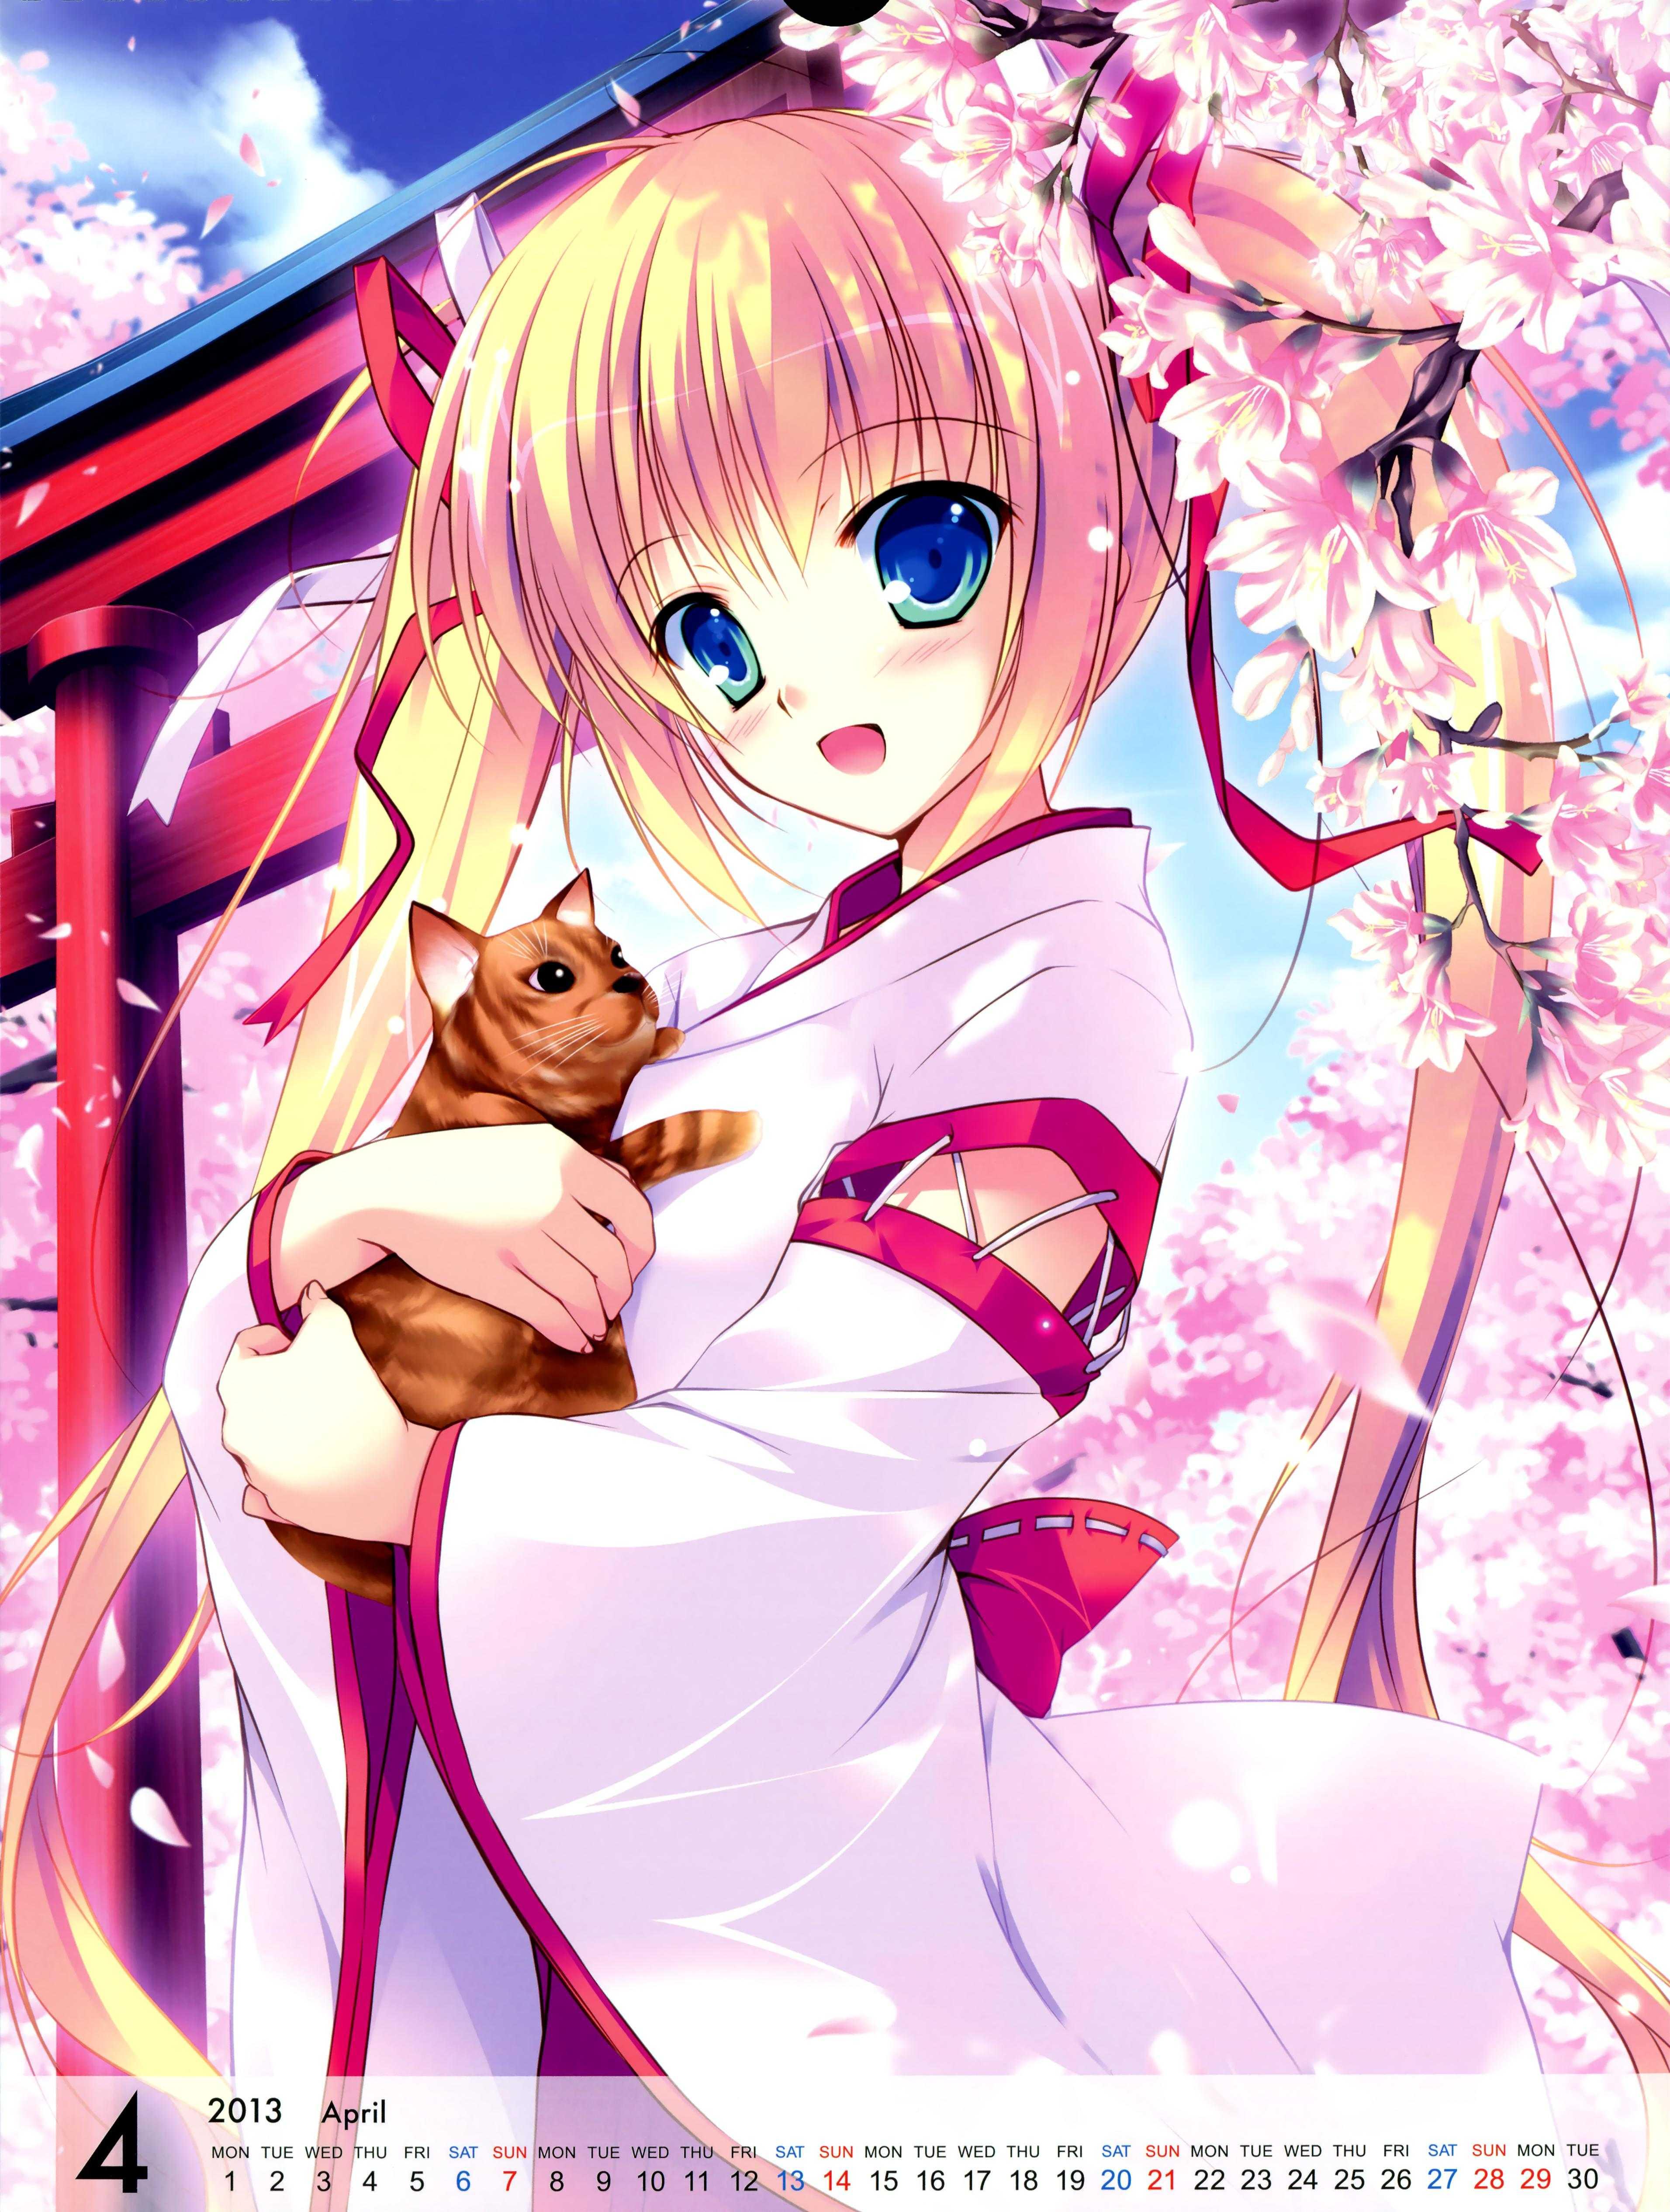 yande.re 240205 calendar mikeou miko neko pink_chuchu